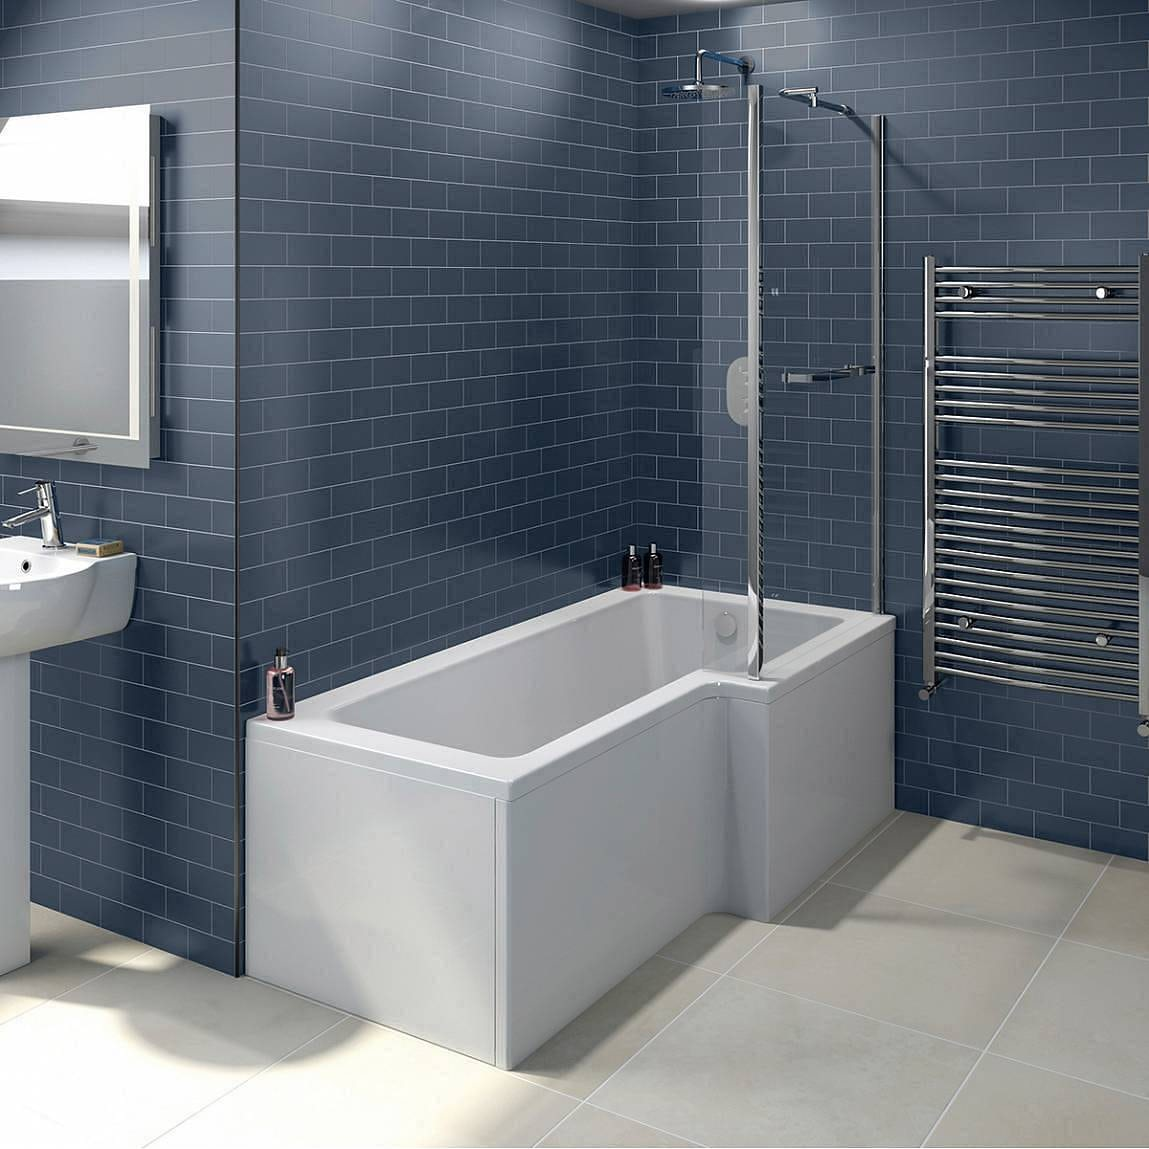 Boston Shower Bath 1700 x 850 RH inc. Screen & Towel Rail